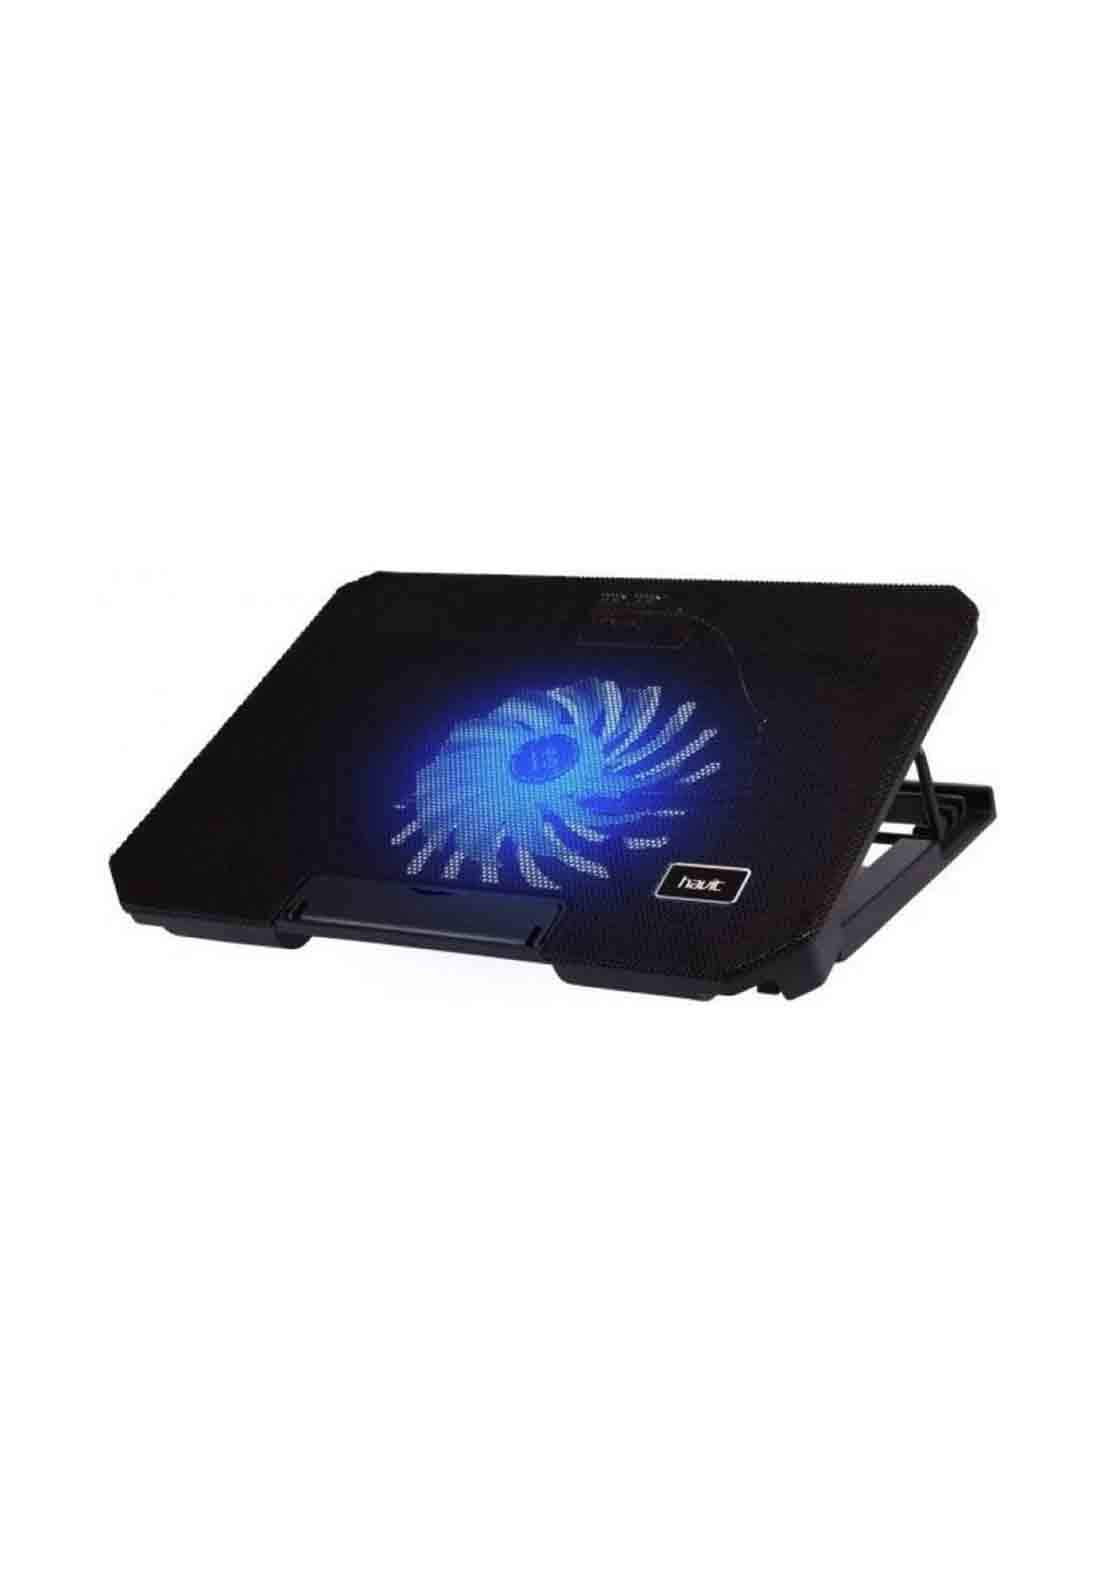 Havit HV-F2030 Single Fan Laptop Cooler With Stand  - Black ستاند لابتوب مع مروحة